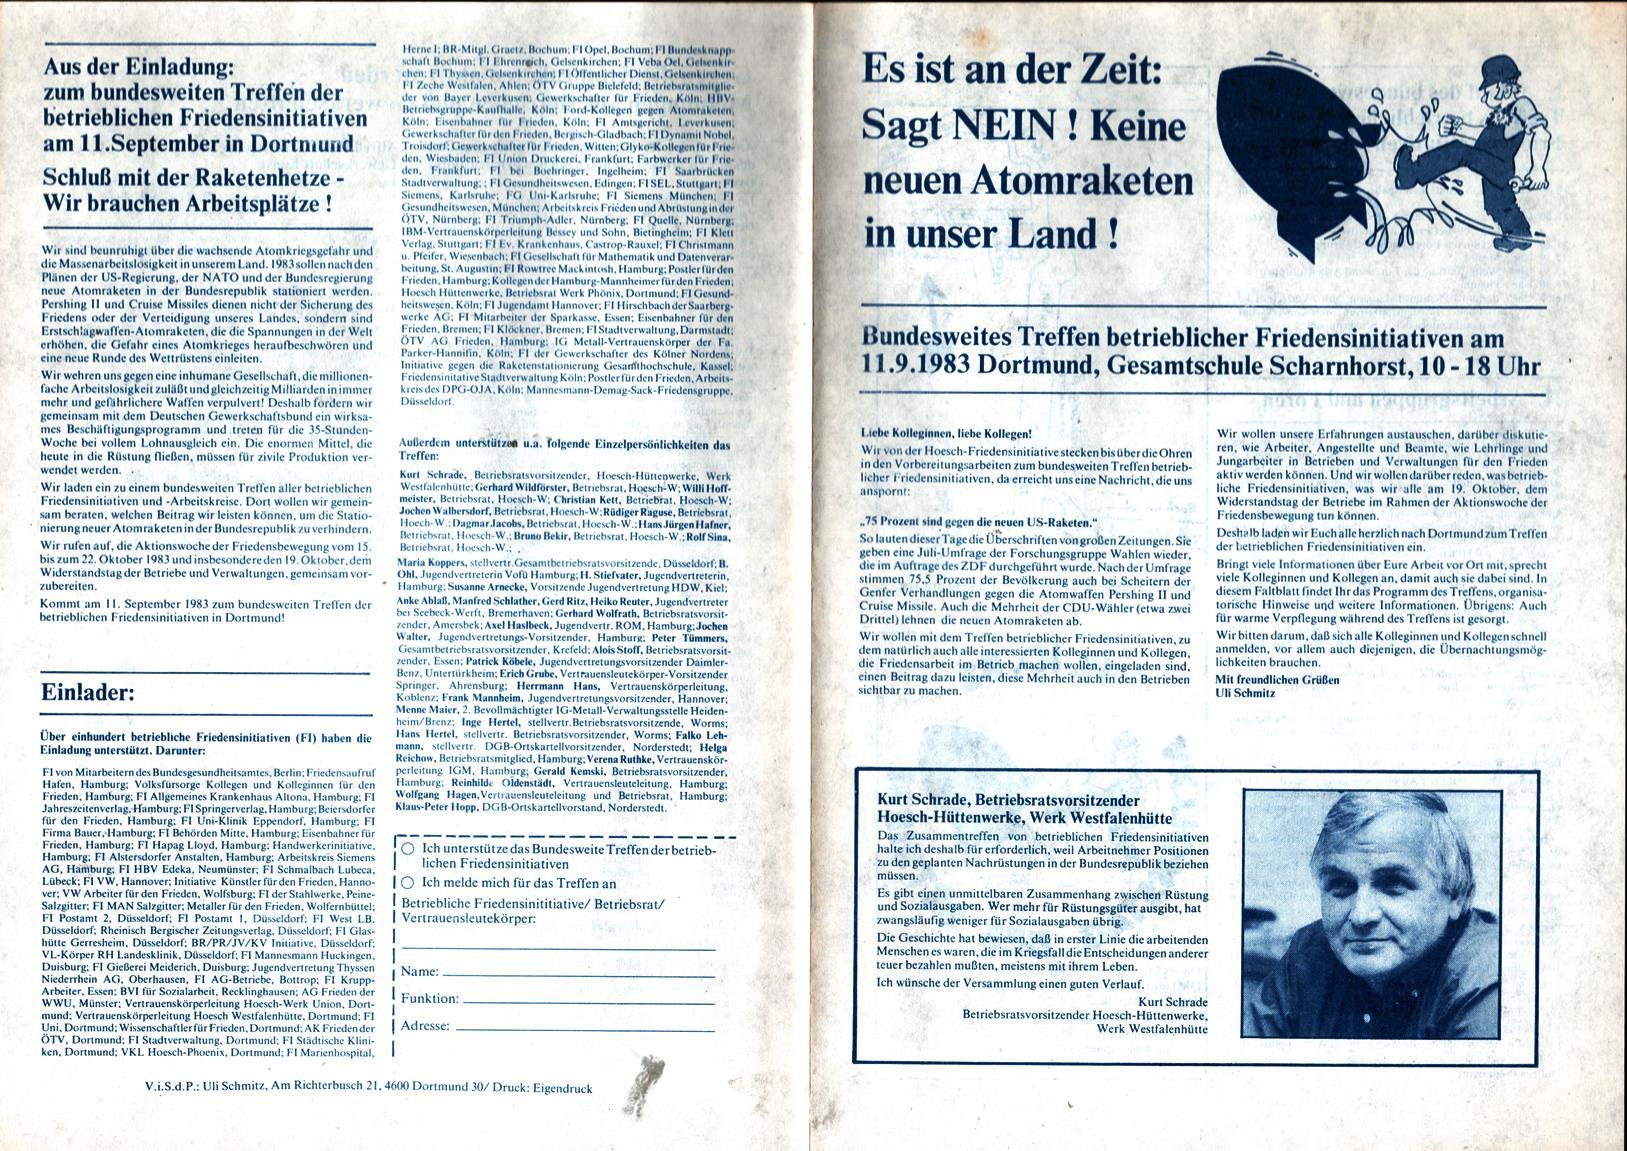 Dortmund_Friedensbewegung_19830907_001